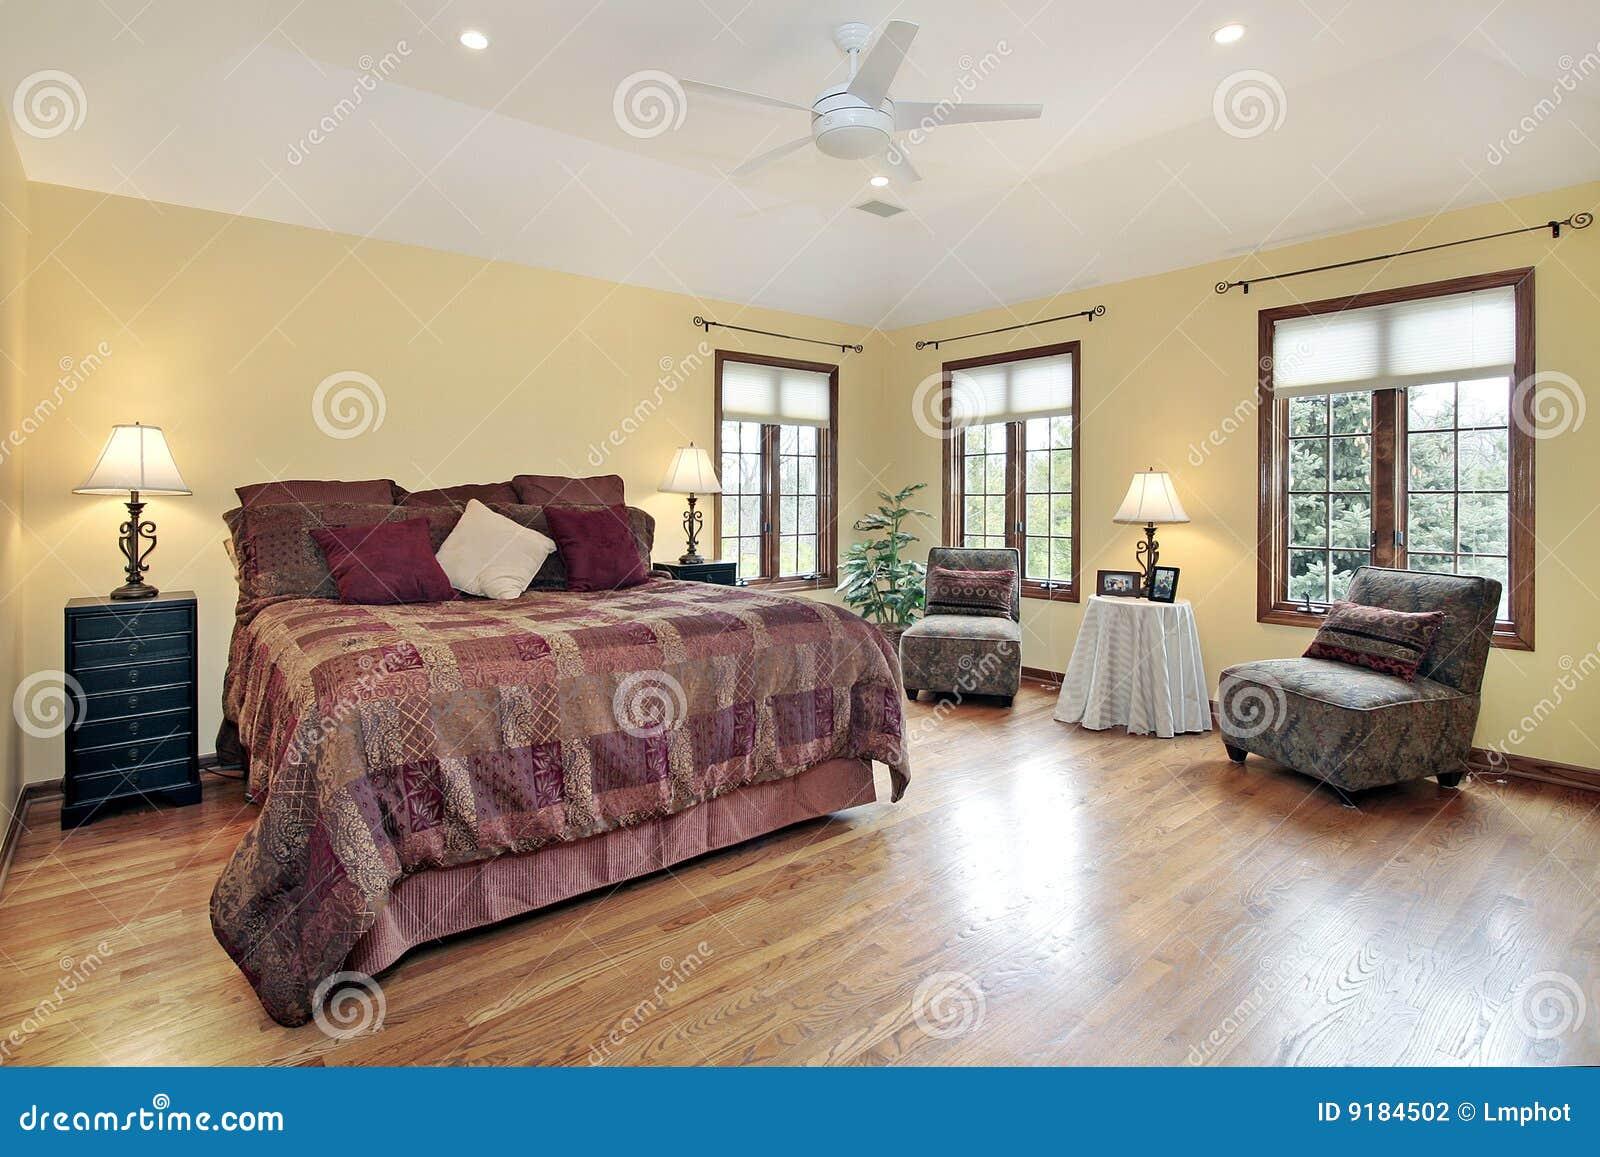 Master Bedroom With Wood Trim Windows Stock Photo Image